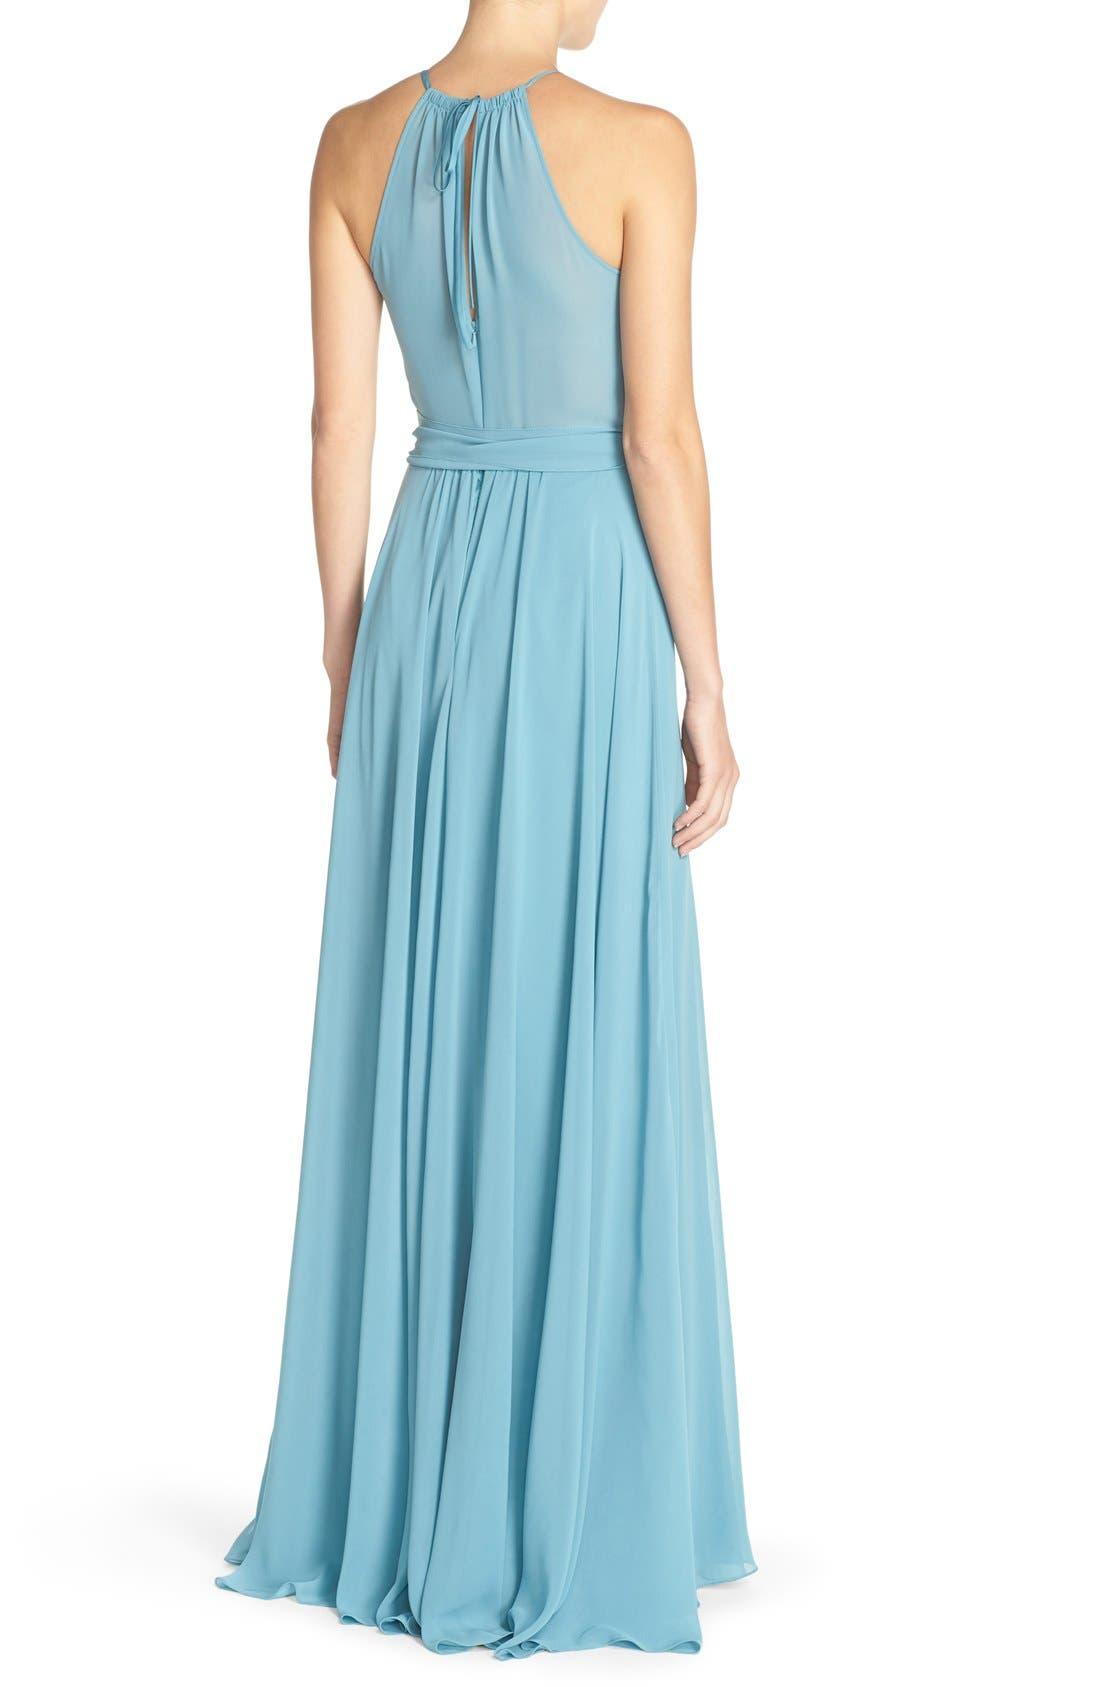 'Delaney' Belted A-Line Chiffon Halter Dress,                             Alternate thumbnail 7, color,